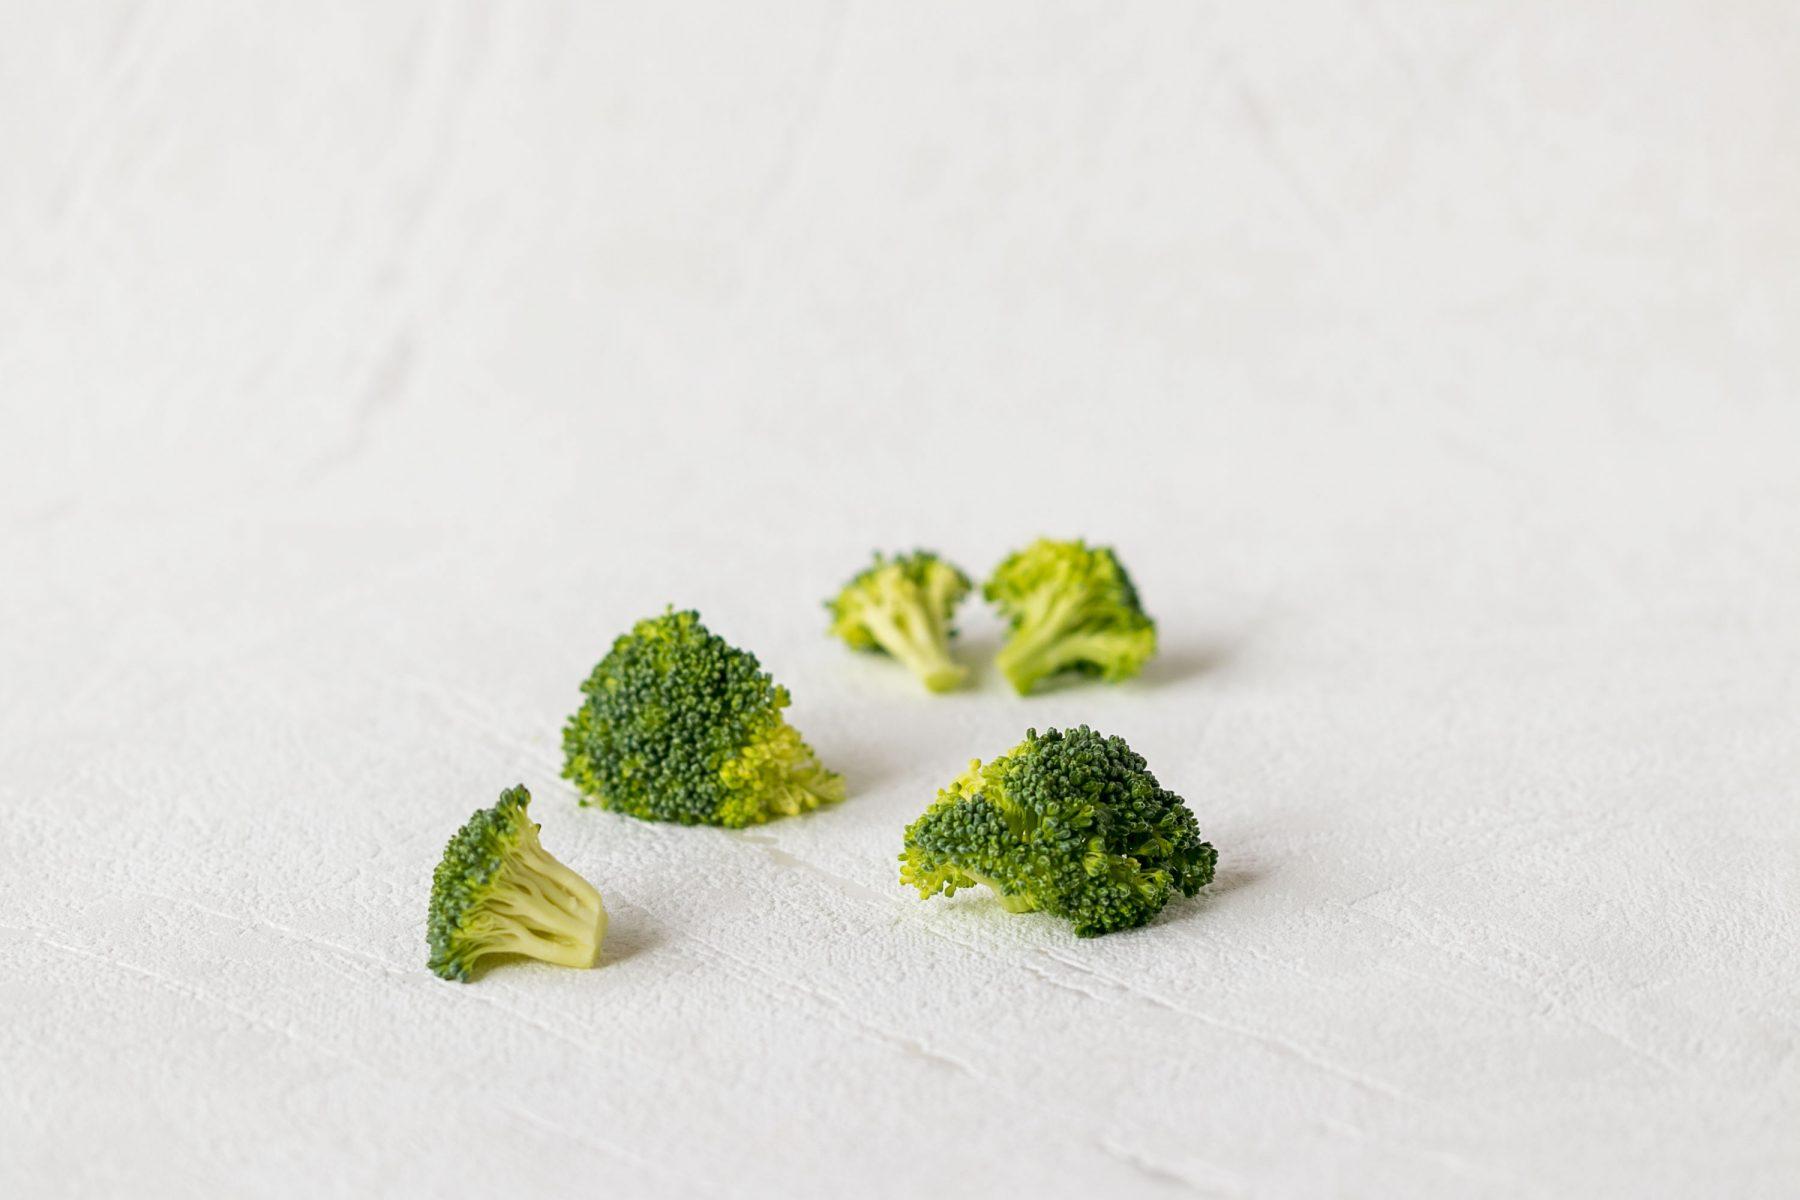 Male ruzicky brokolice na bielom podklade.